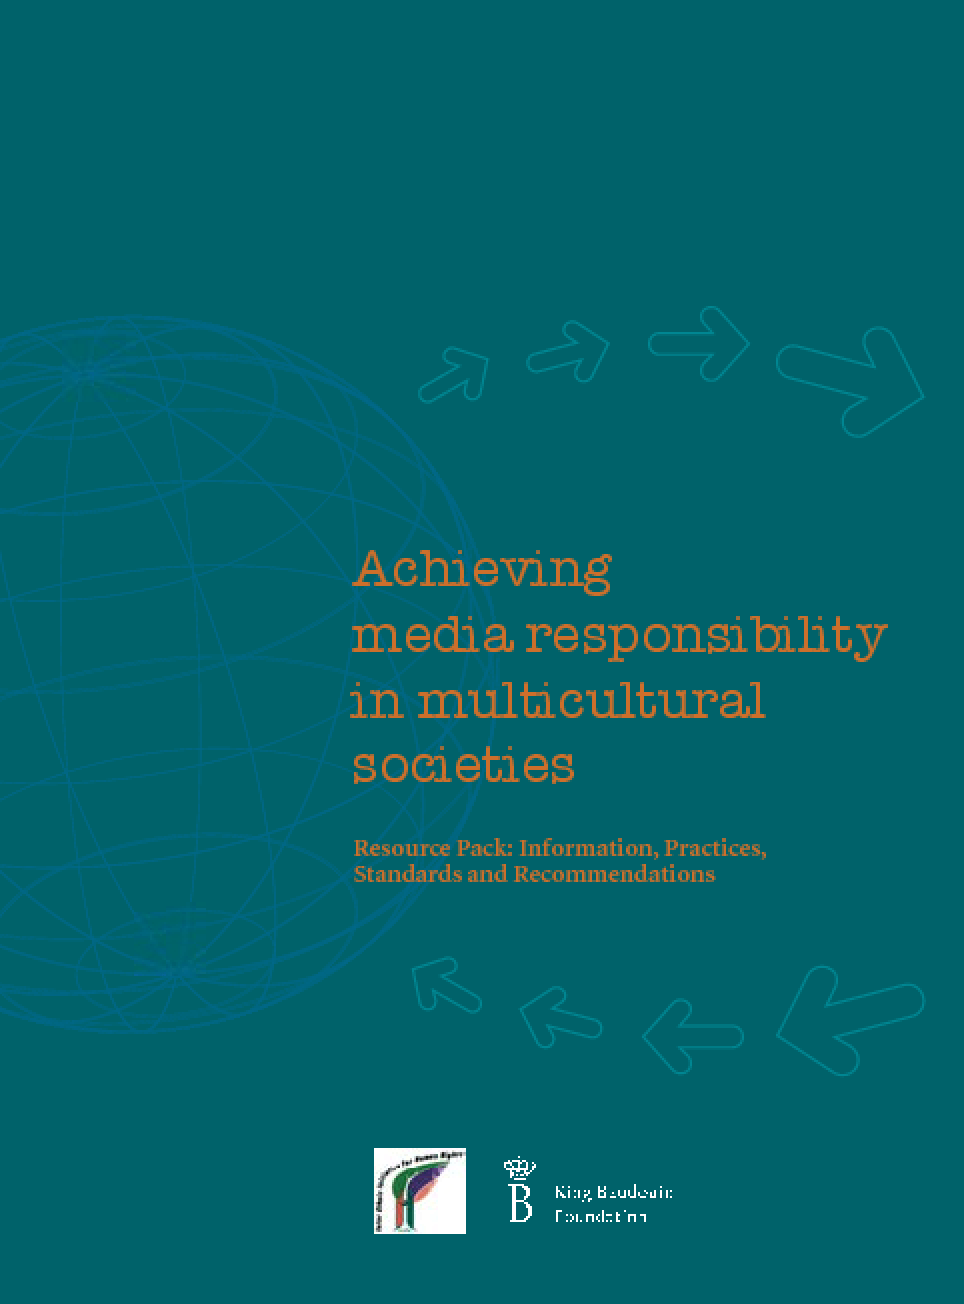 Achieving Media Responsibilities in Multicultural Societies